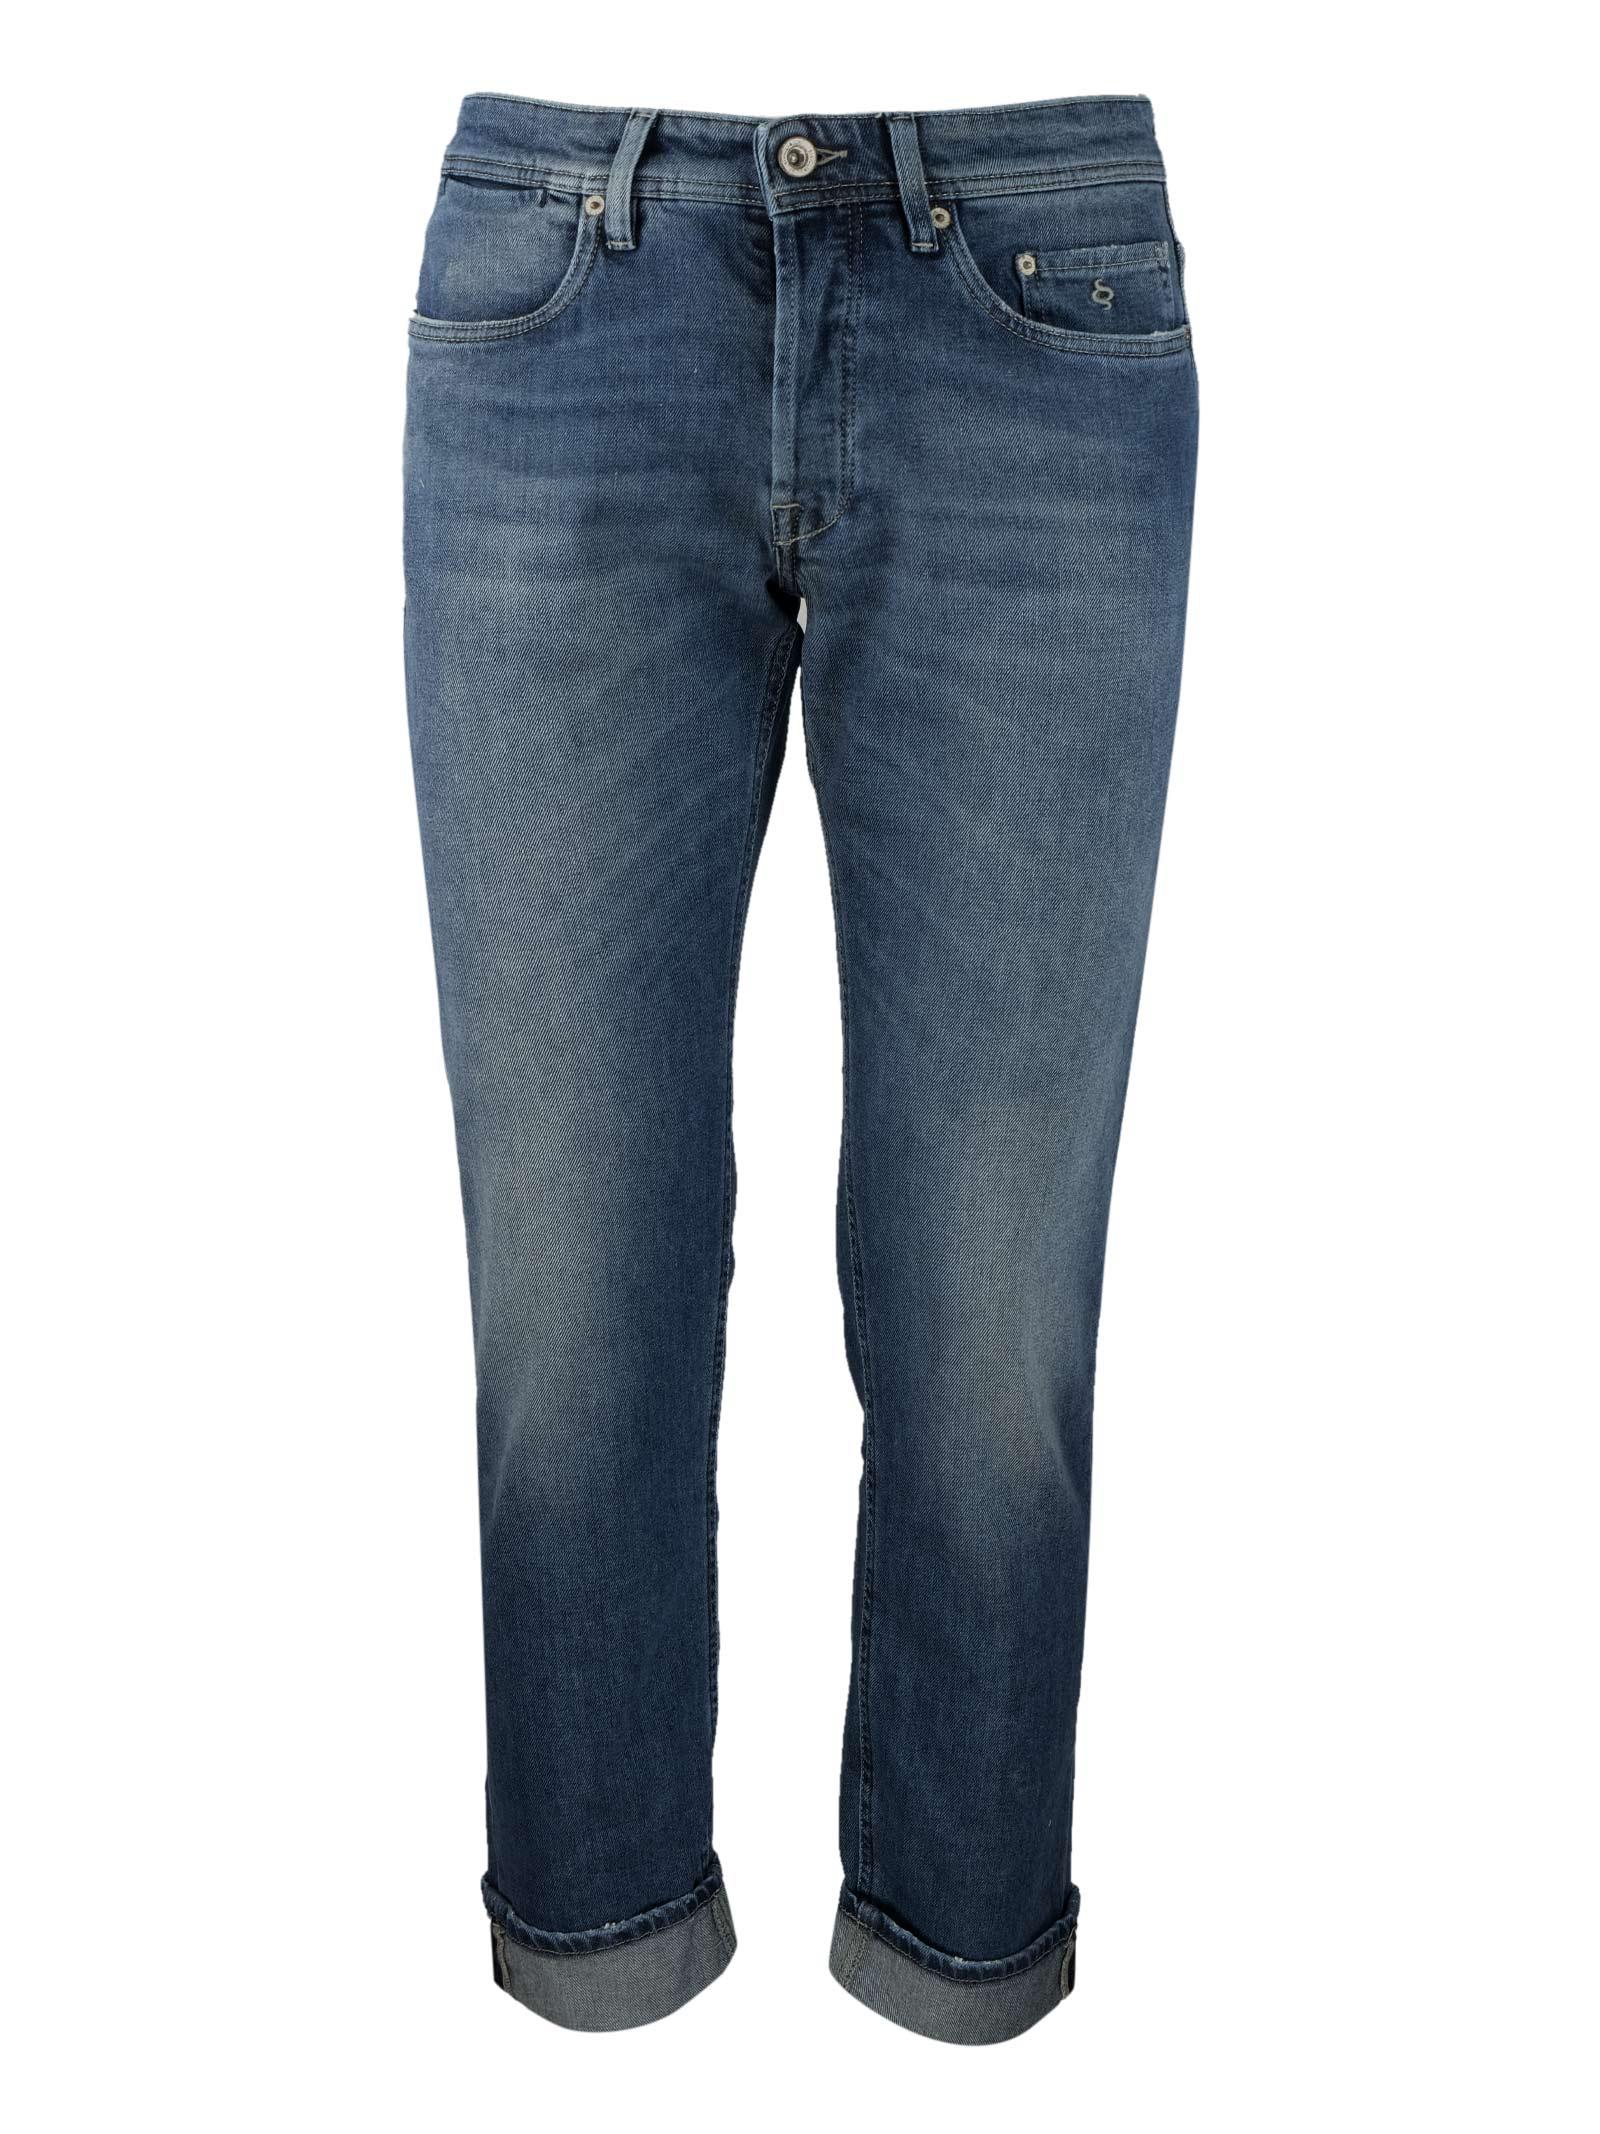 Dark bleached 10oz. jeans SIVIGLIA | Trousers | MQ2000 803406002